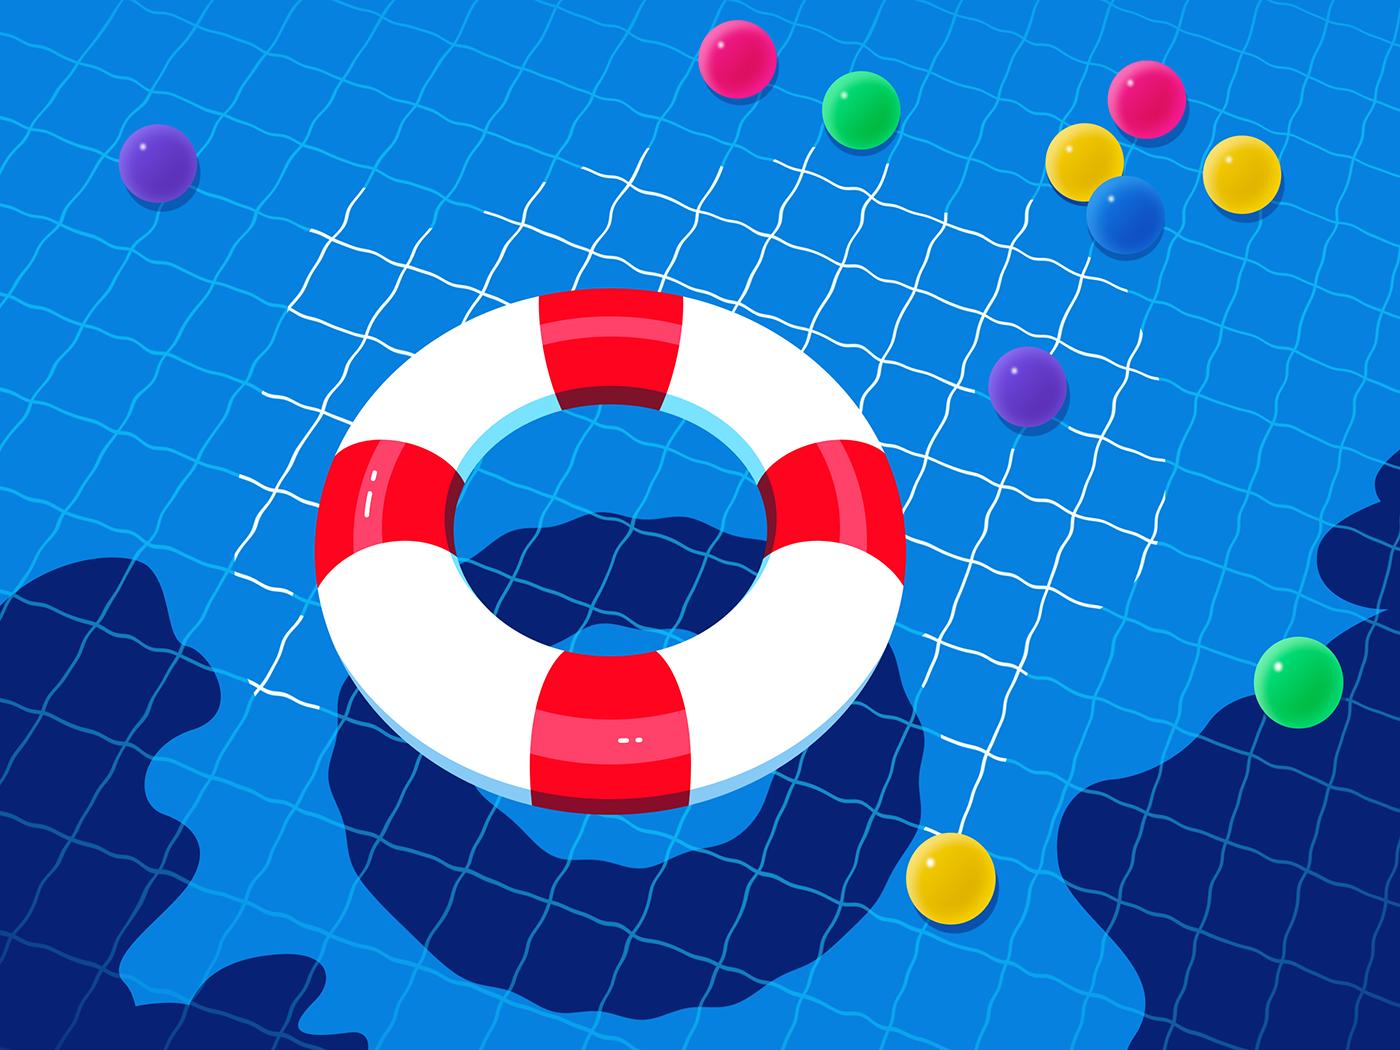 Swimming pool water ball swimming ring illustration